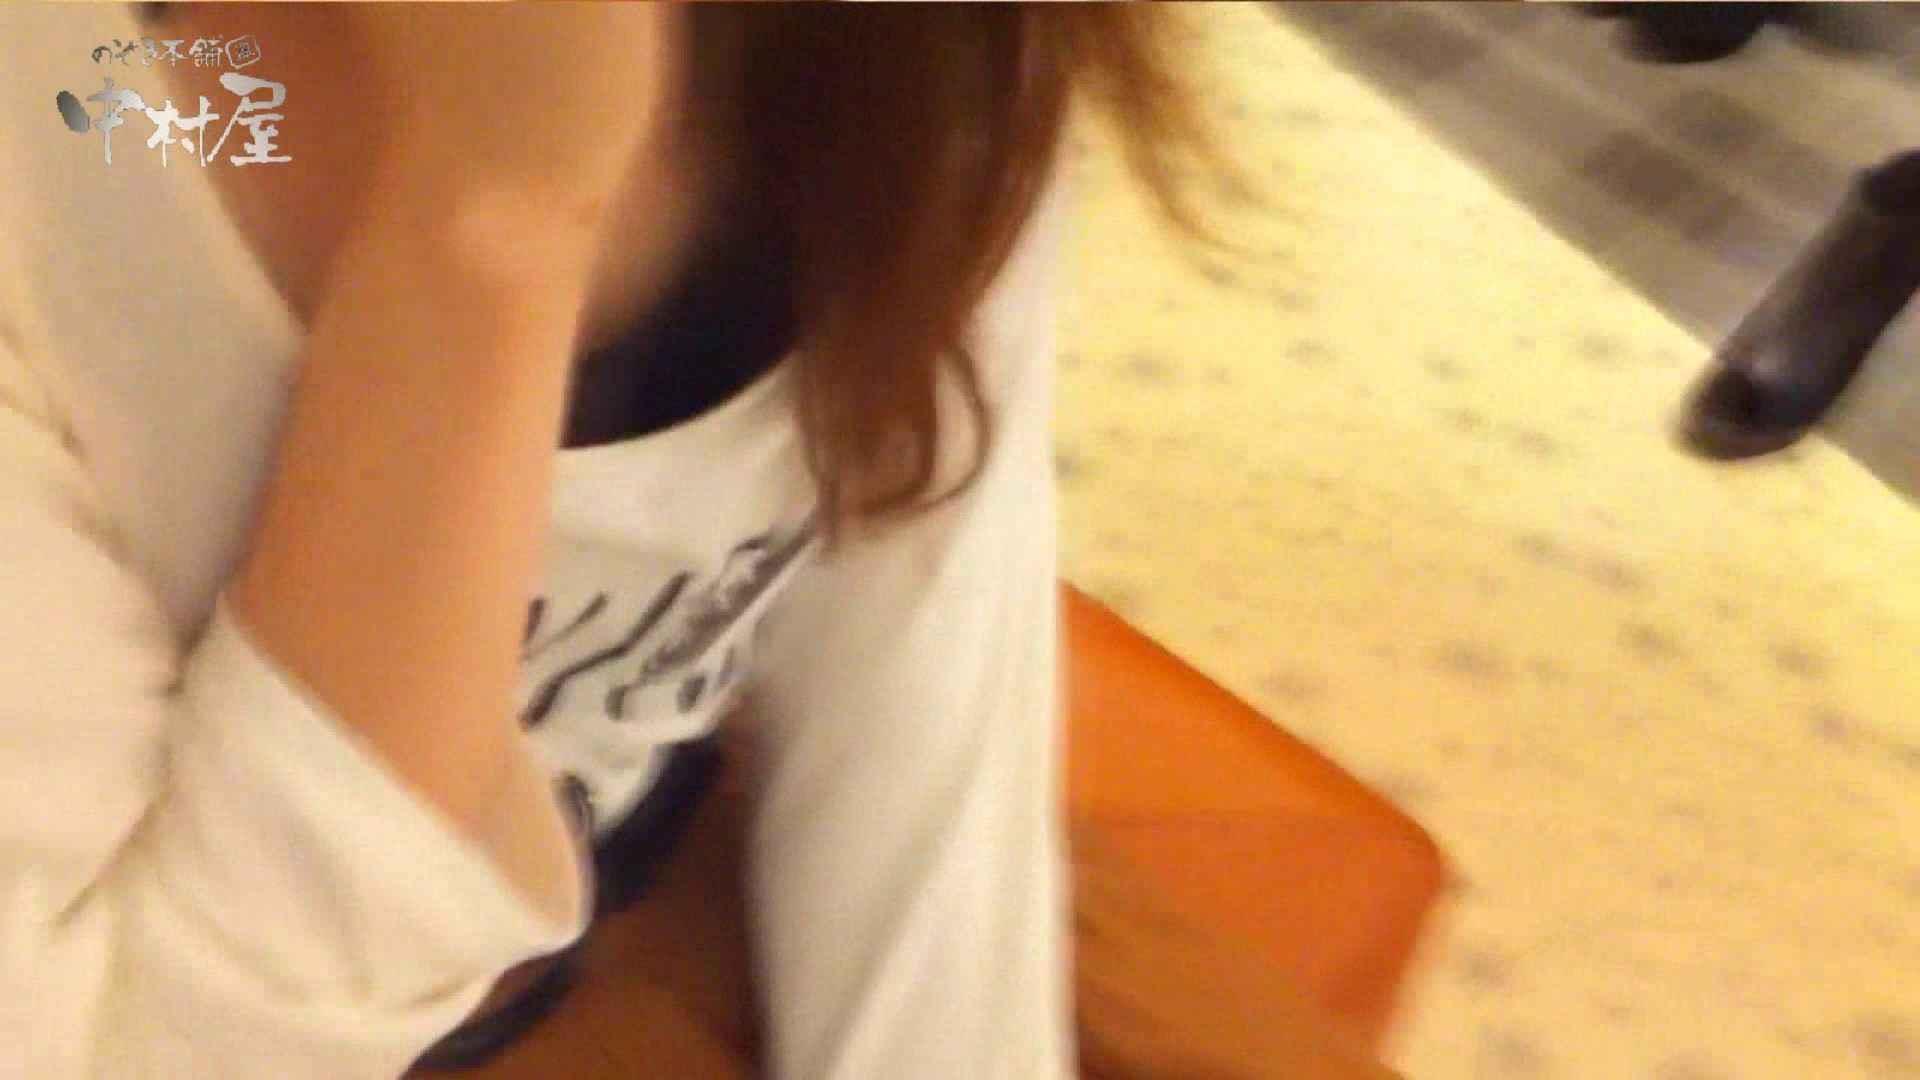 vol.84 美人アパレル胸チラ&パンチラ 帽子オネェさんに胸元アタック! 接写  94連発 36